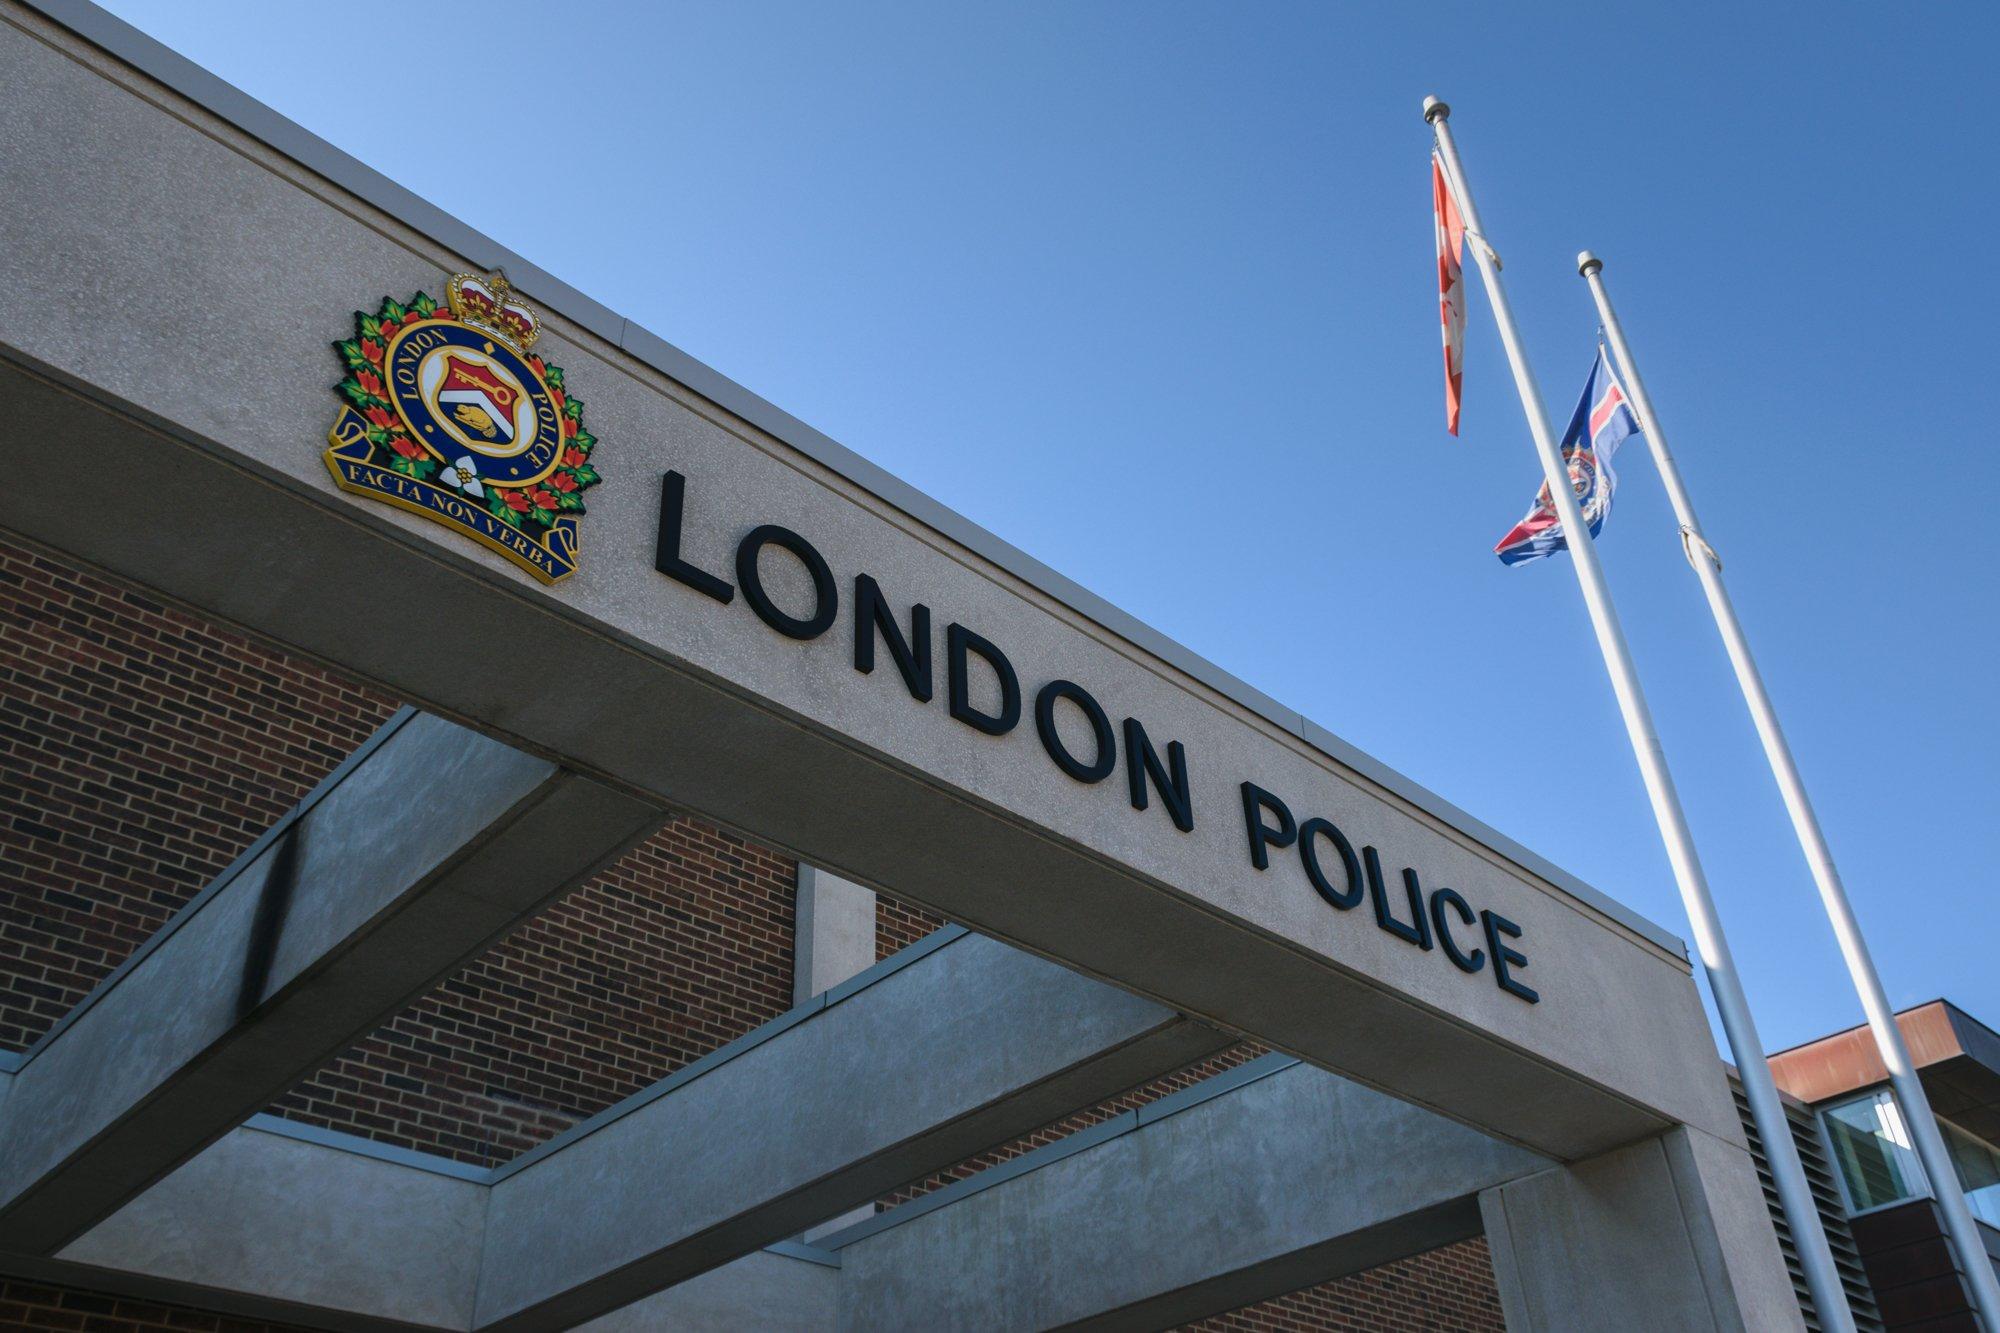 Coronavirus: London police close headquarters to the public